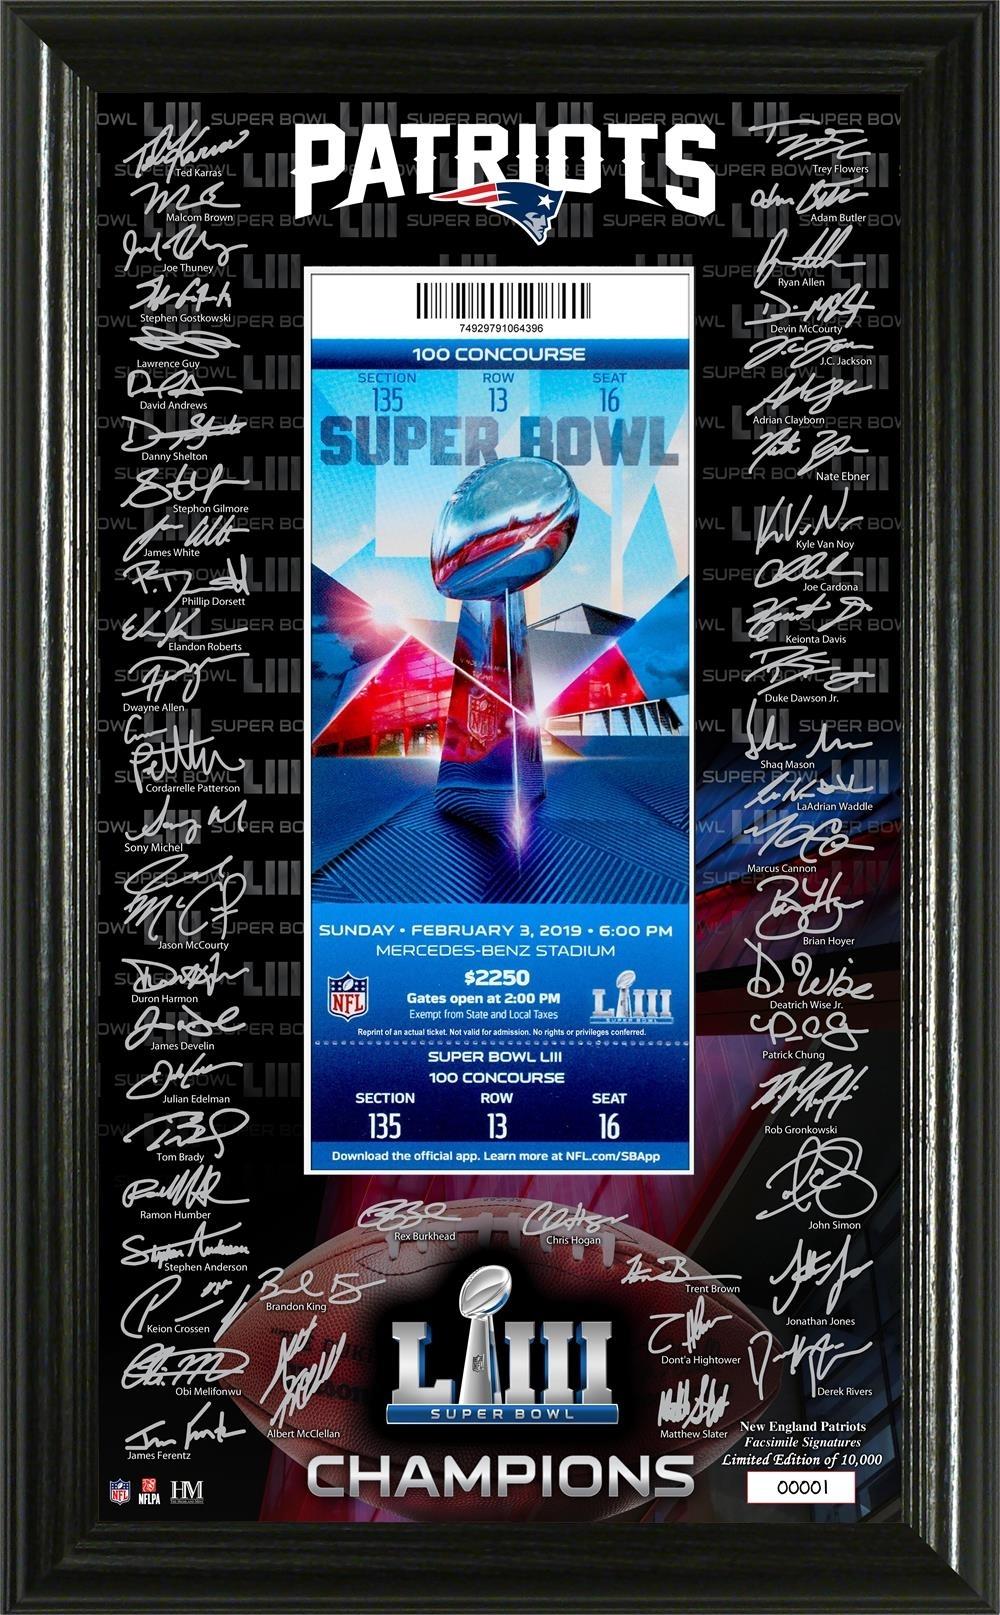 New England Patriots Super Bowl 53 Champions Signature Ticket with regard to Miami Super Bowl Ticket Prices